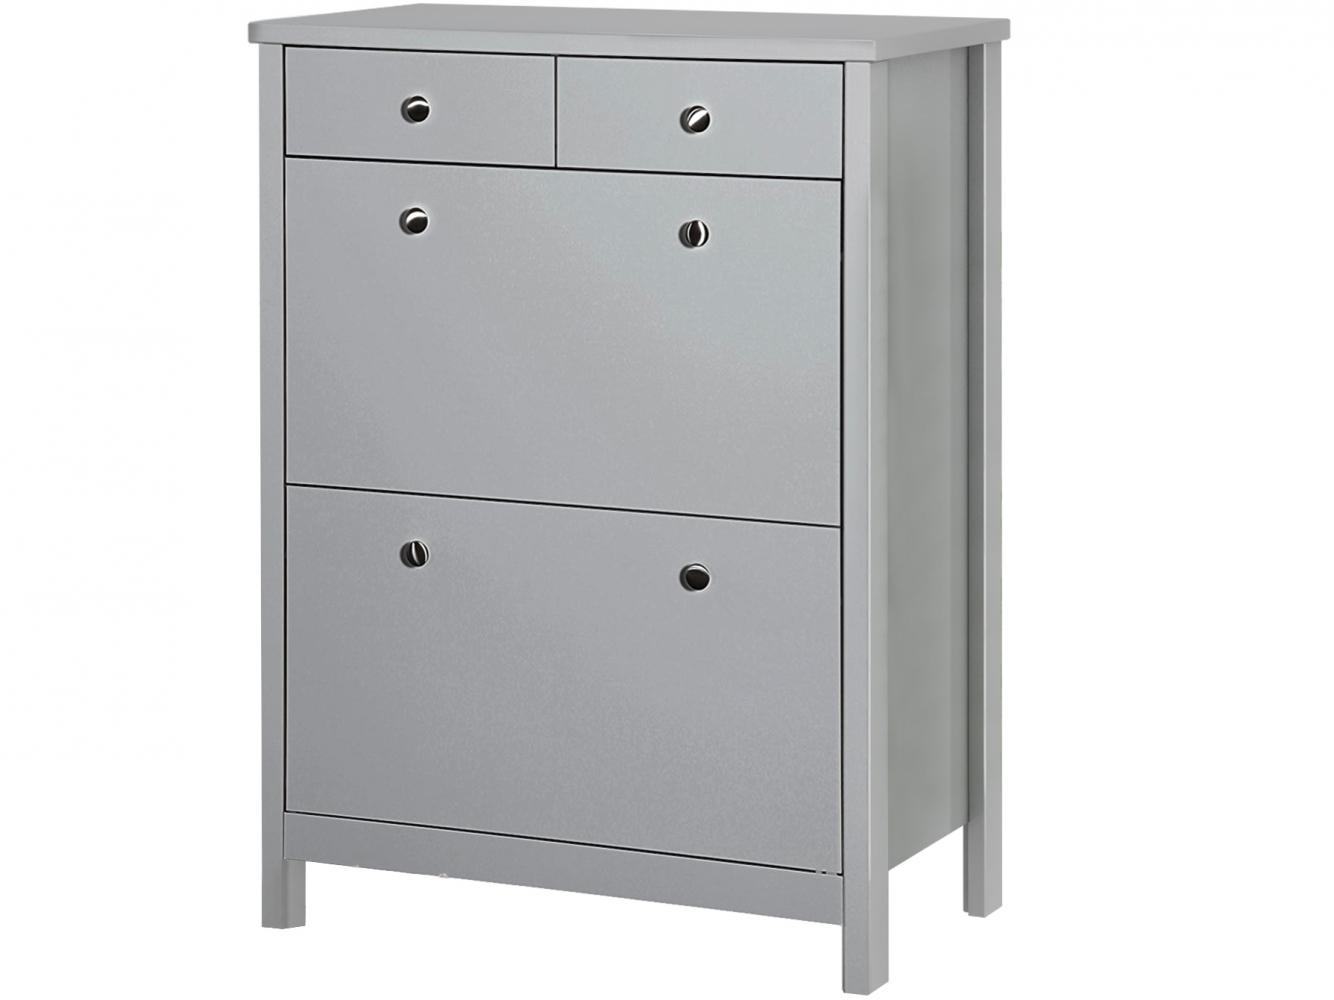 Botník Tange, 106 cm, šedá